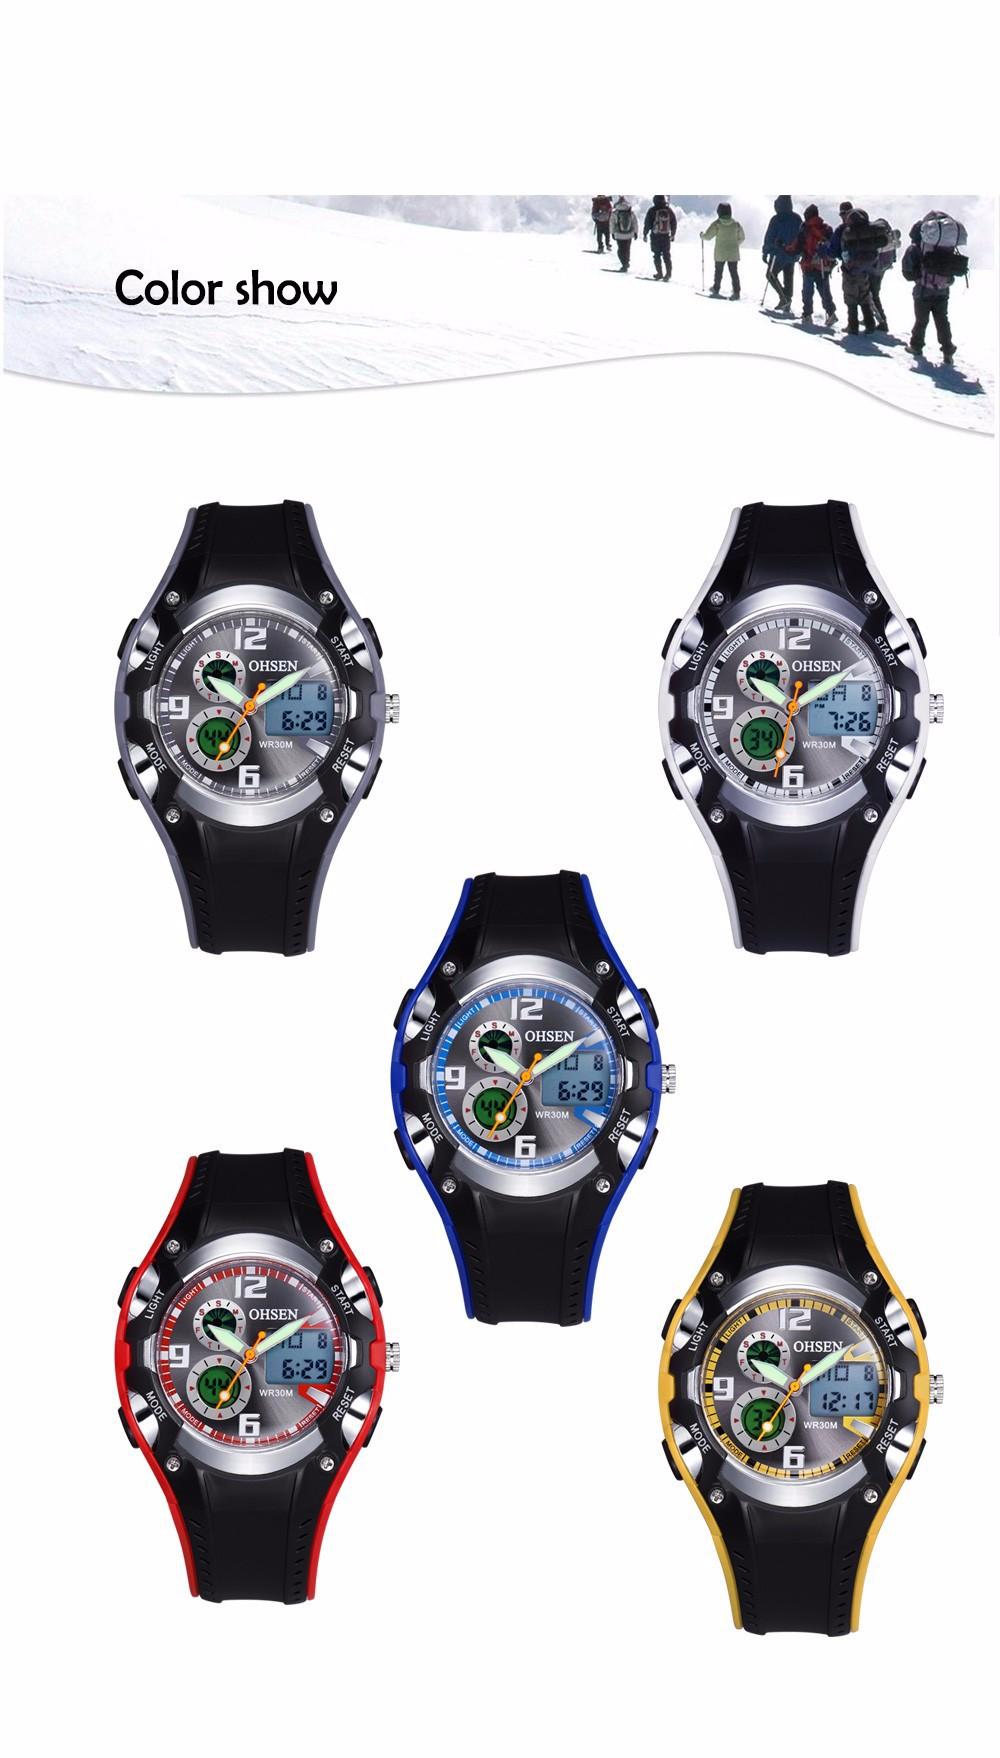 Original Ohsen Brand Fashion Sports Men's Watches 30M Waterproof Rubber Black Rubber Band Digital Sport Wristwatch for Men Gift (22)